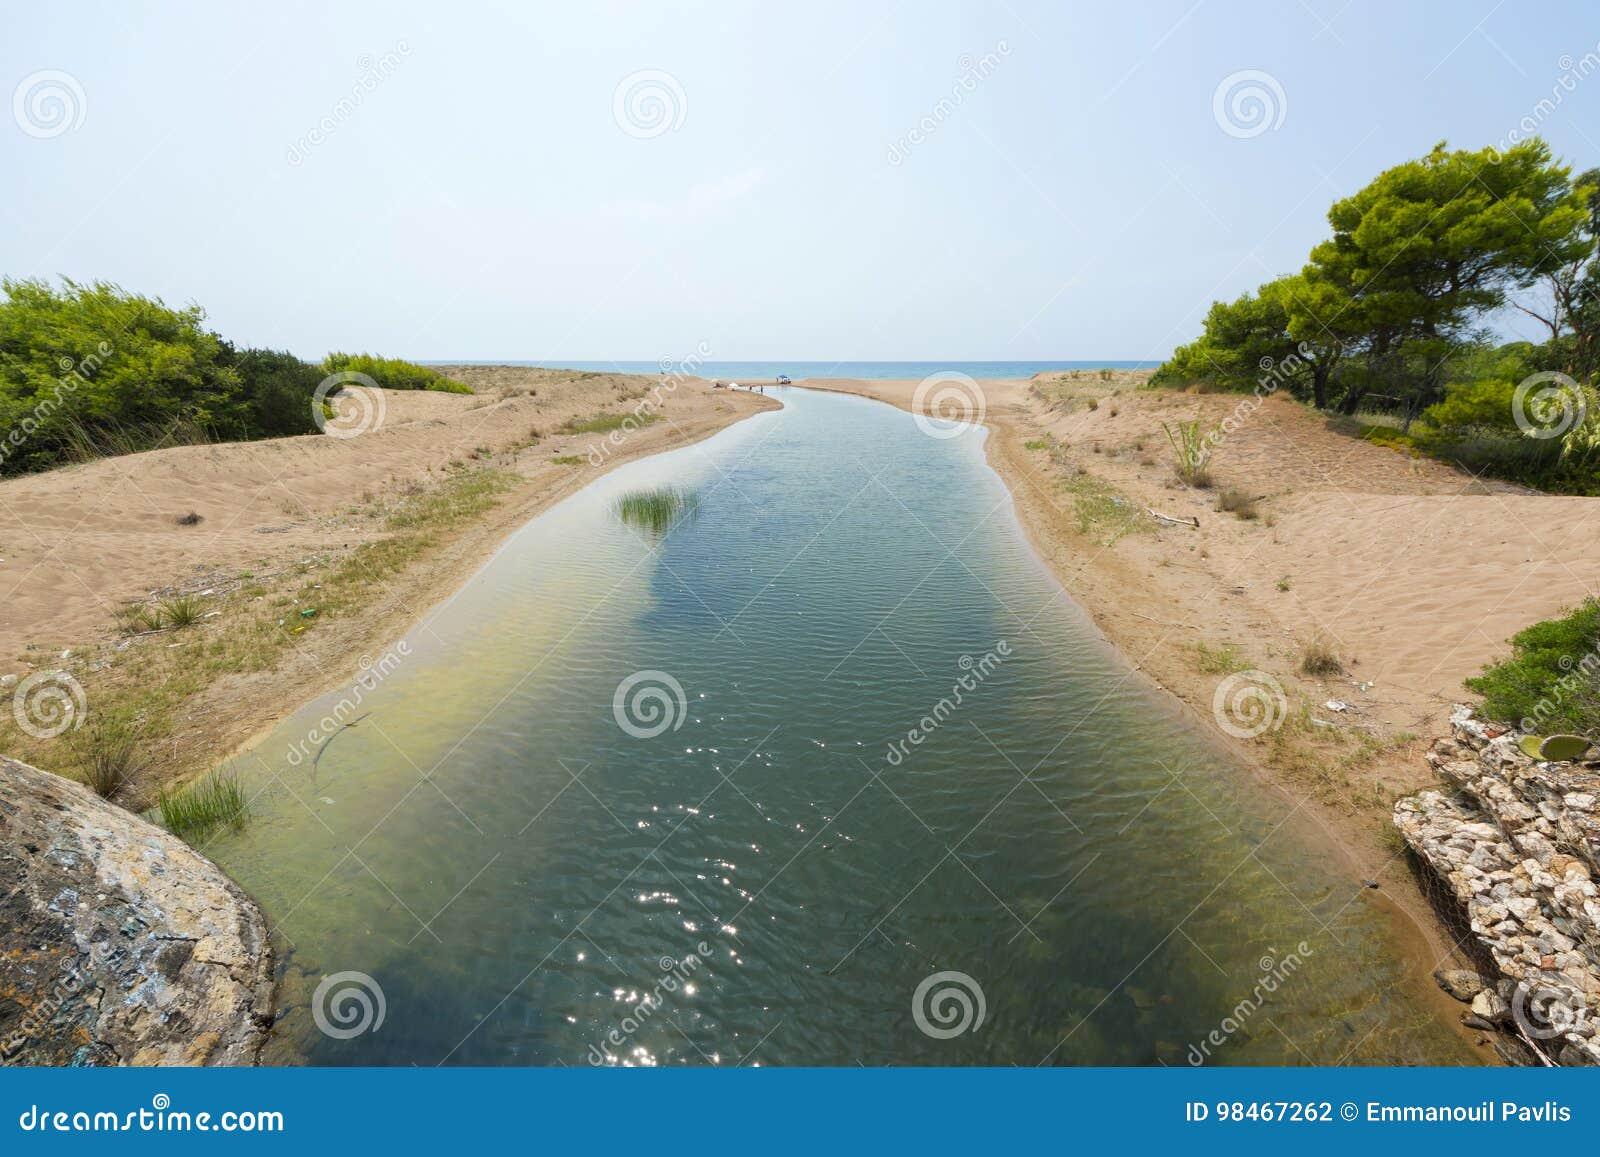 Utskjutning av Kaiafas sjön in i havet, Grekland